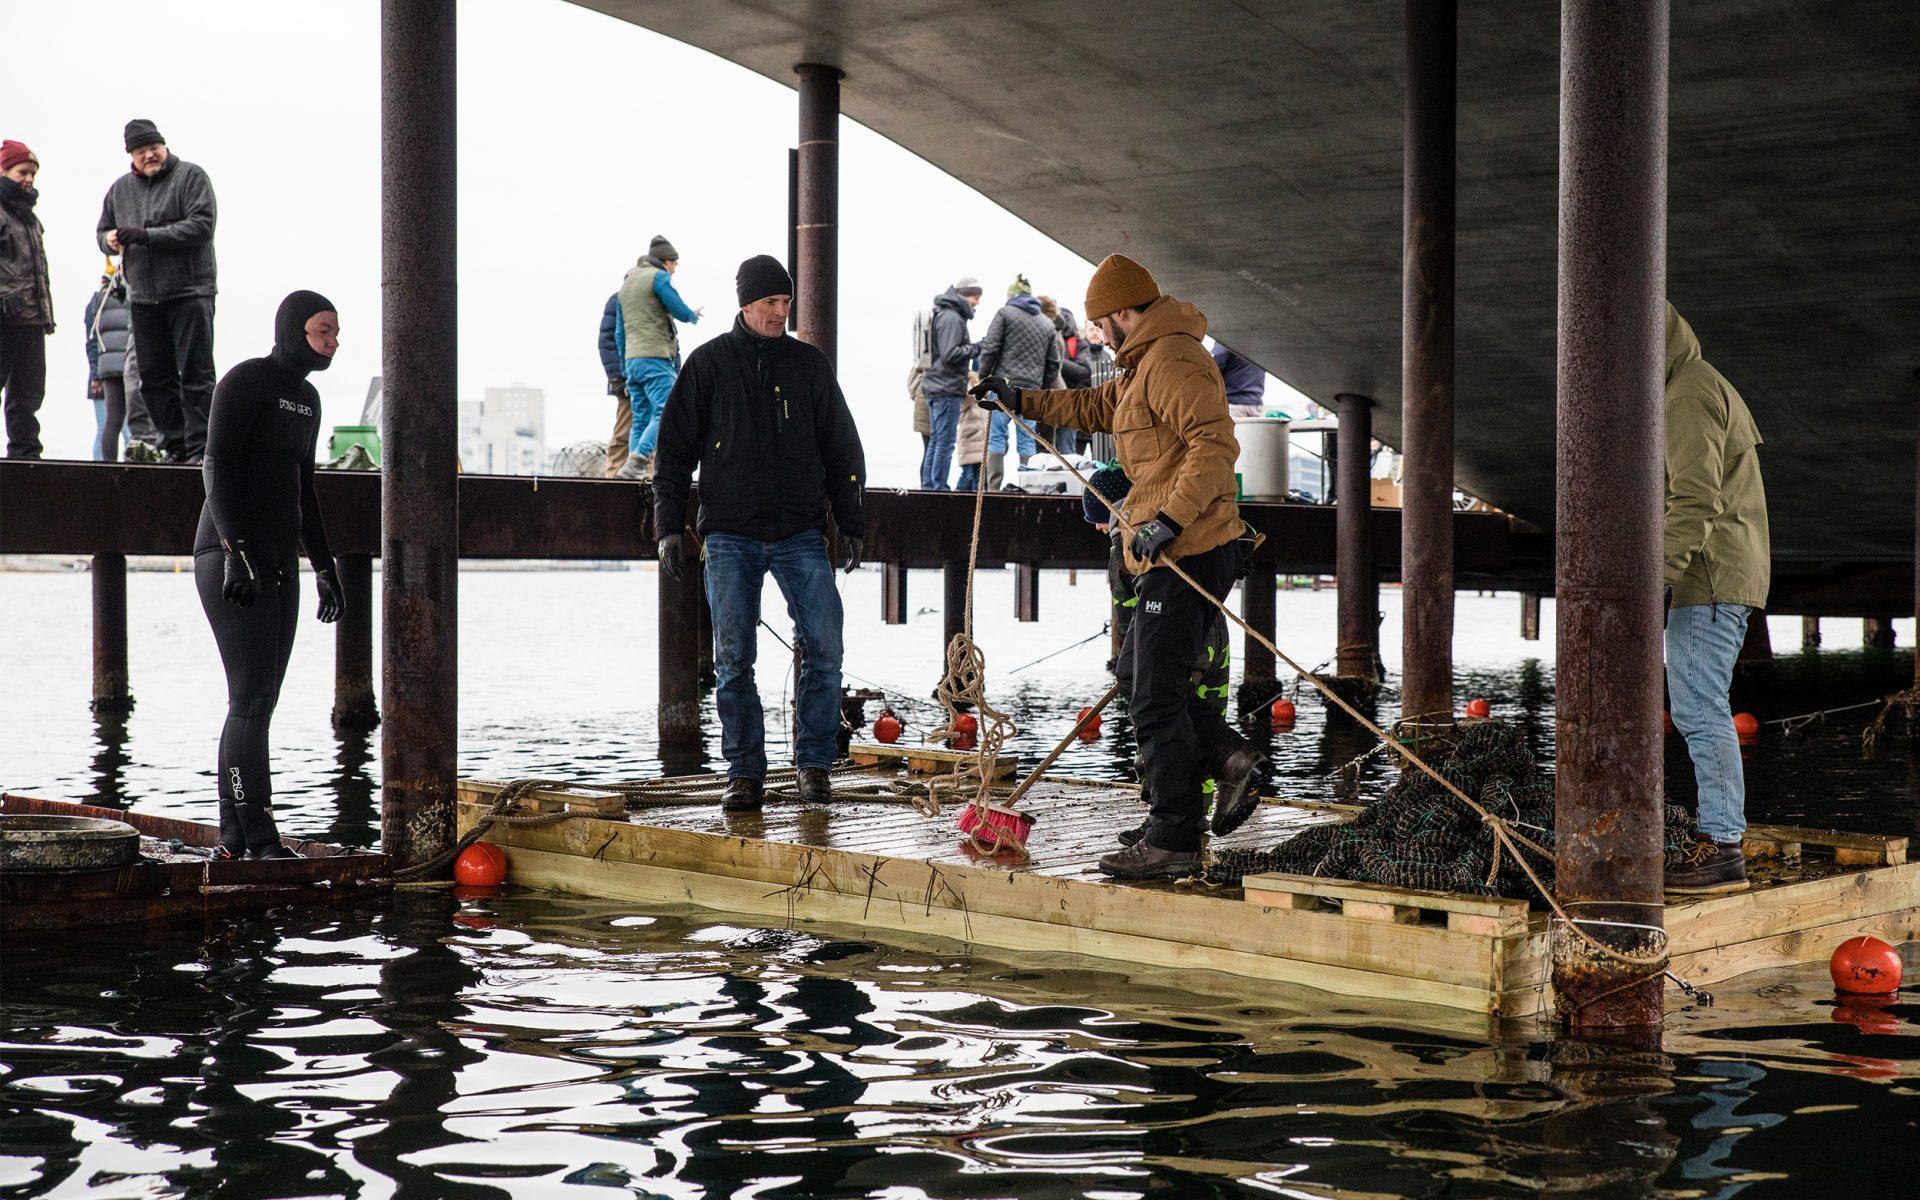 Bliv havbonde for en dag / Foto: Andreas Raun Arneberg